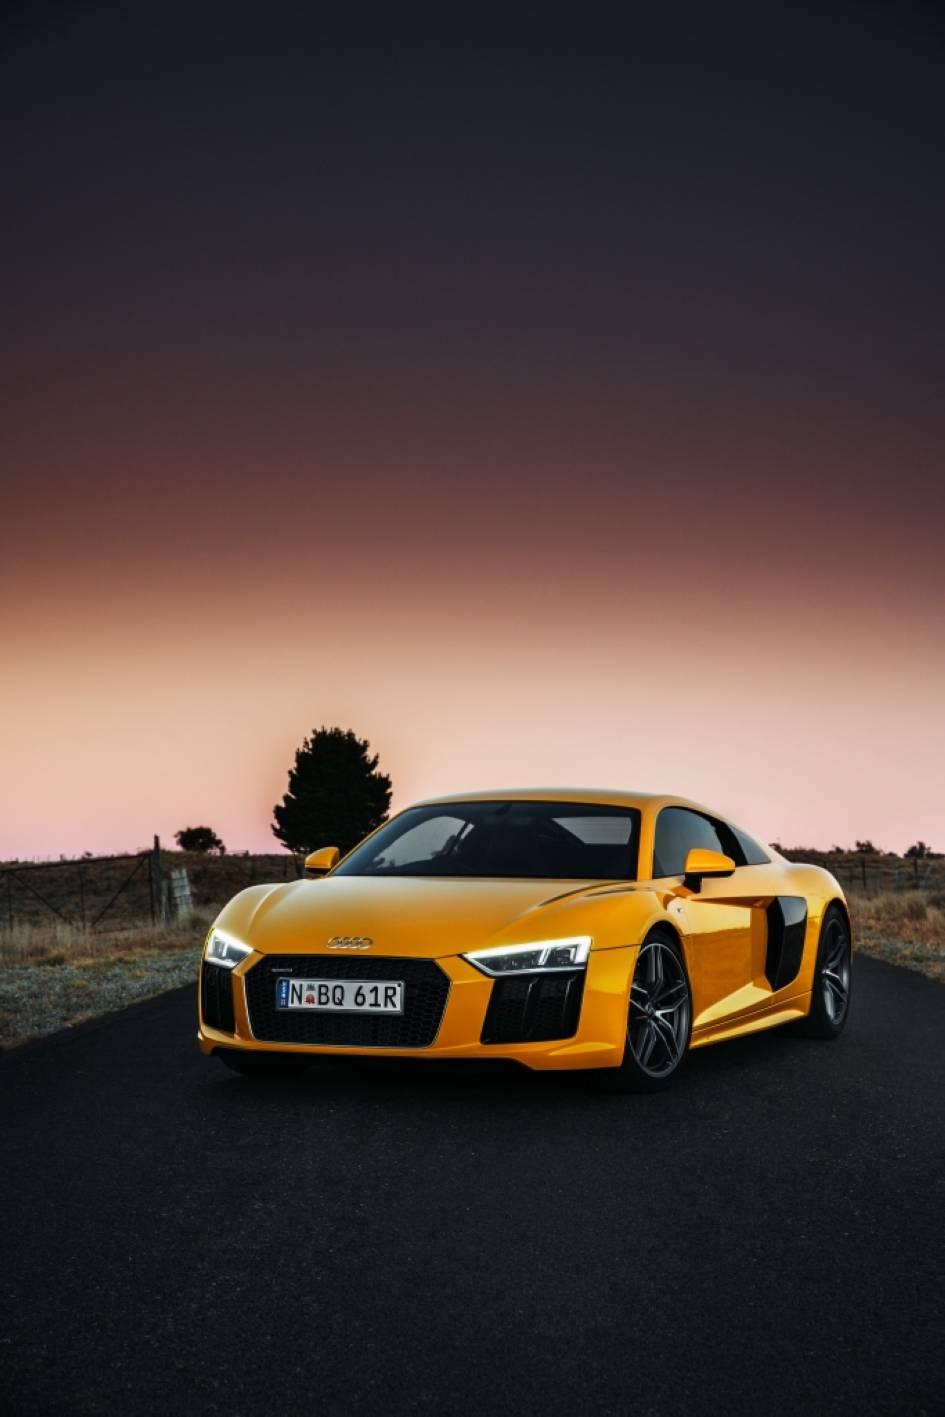 2016 Audi A6 3 0t Interior: 2016 Audi R8 V10 And V10 Plus Coupe Arrives In Australia